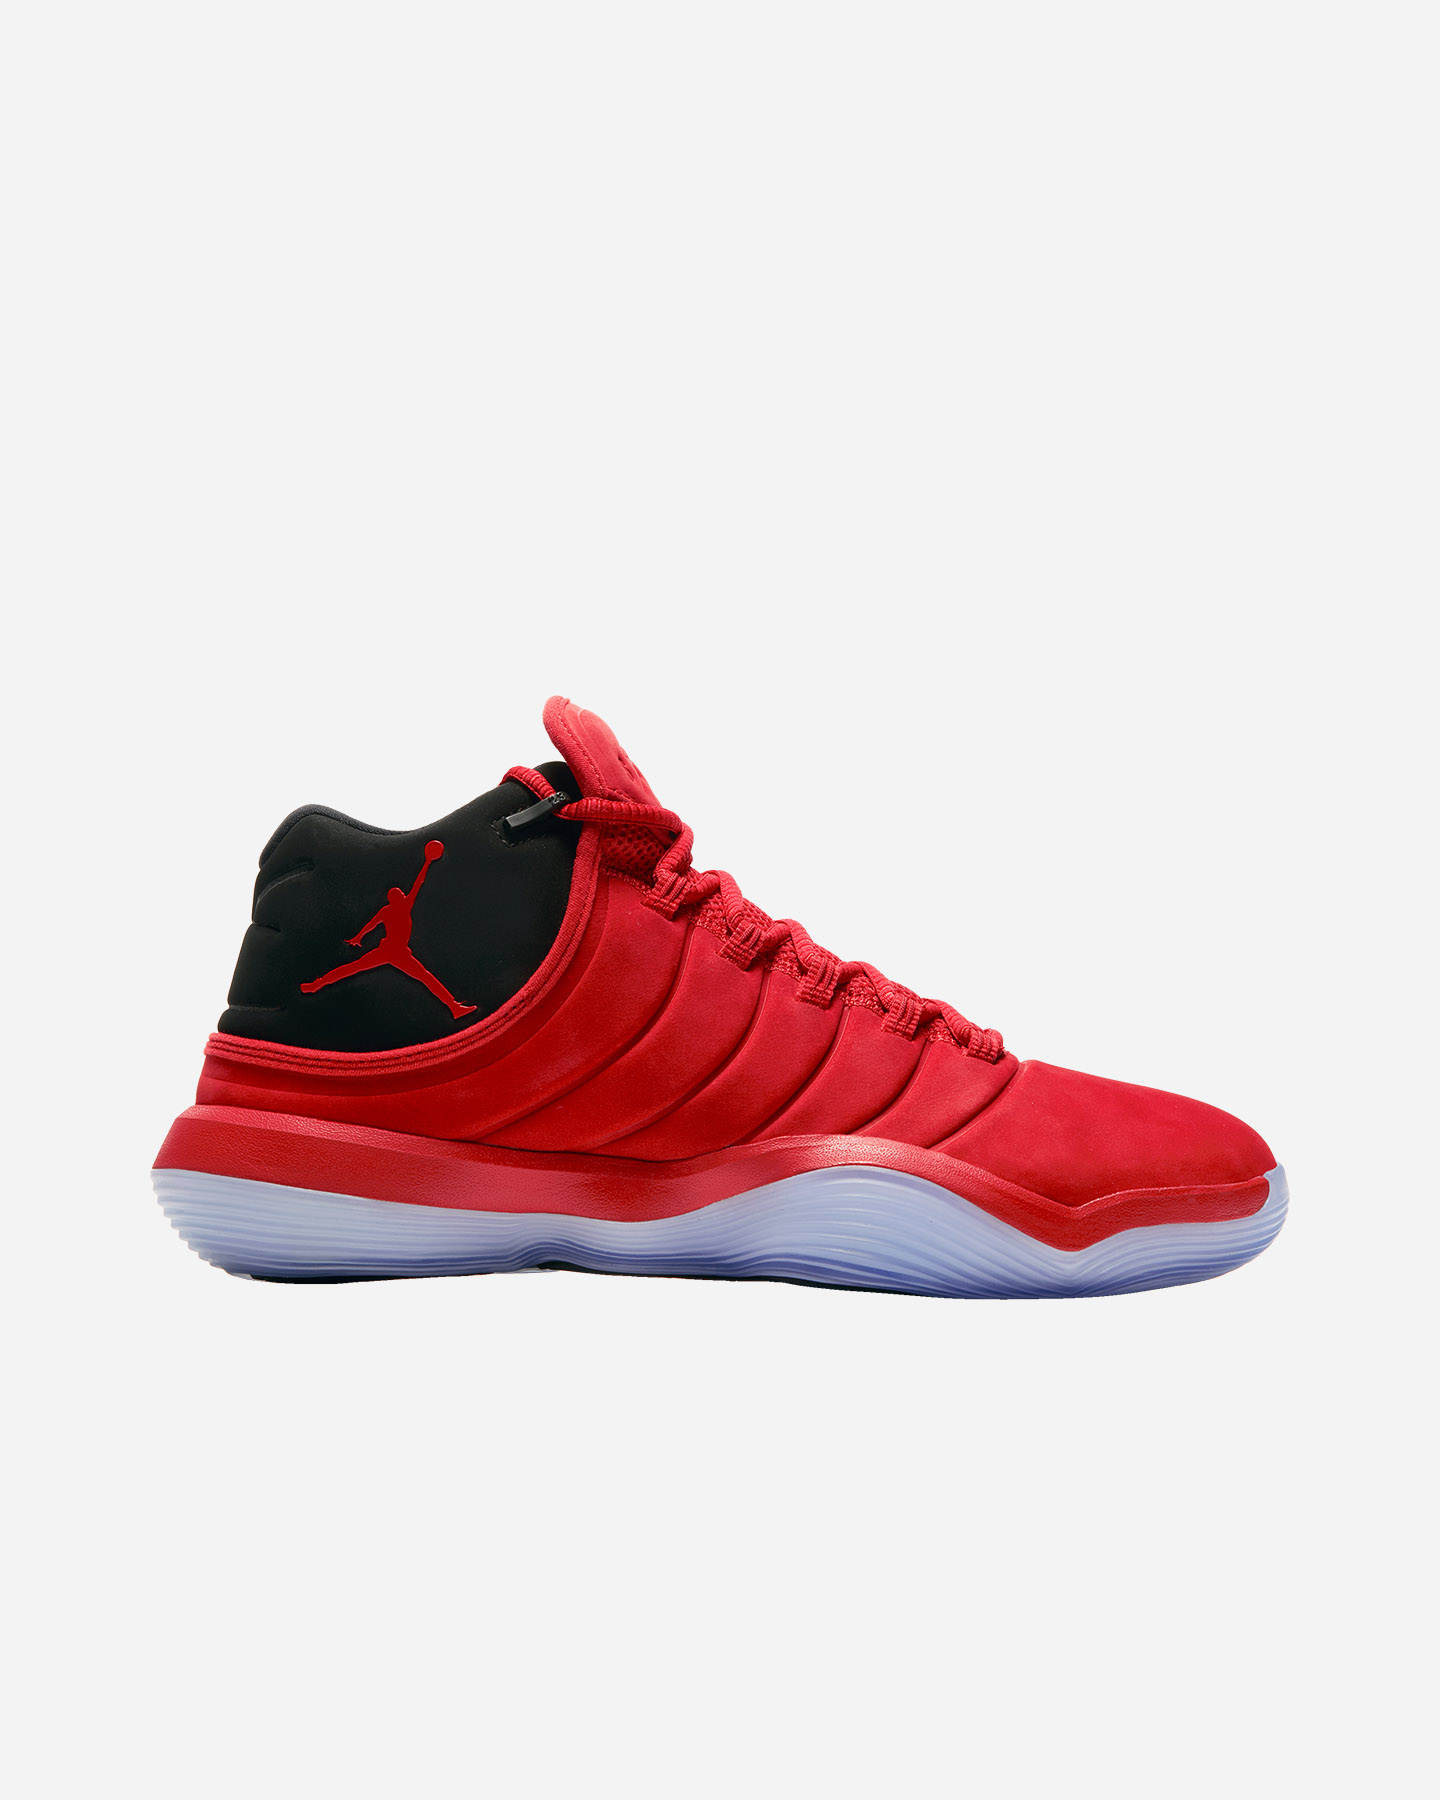 modelli scarpe basket nike